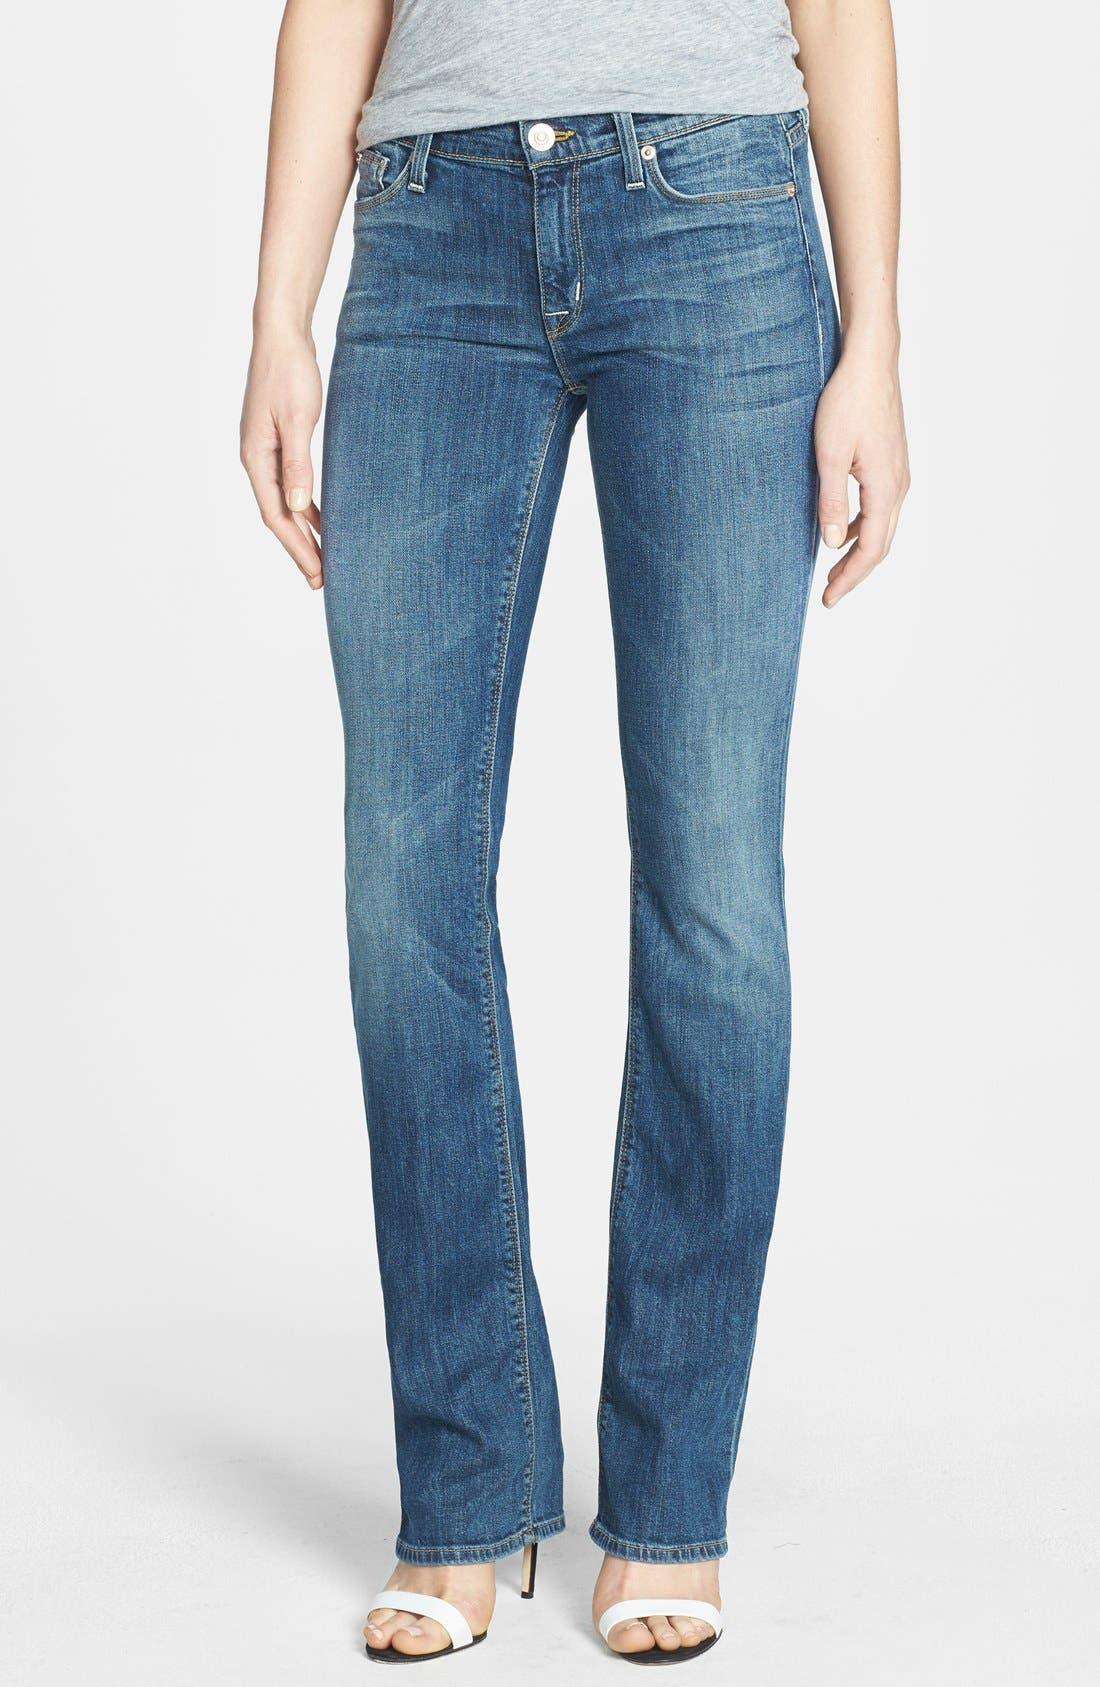 Main Image - Hudson Jeans 'Elle' Baby Bootcut Jeans (Hackney)